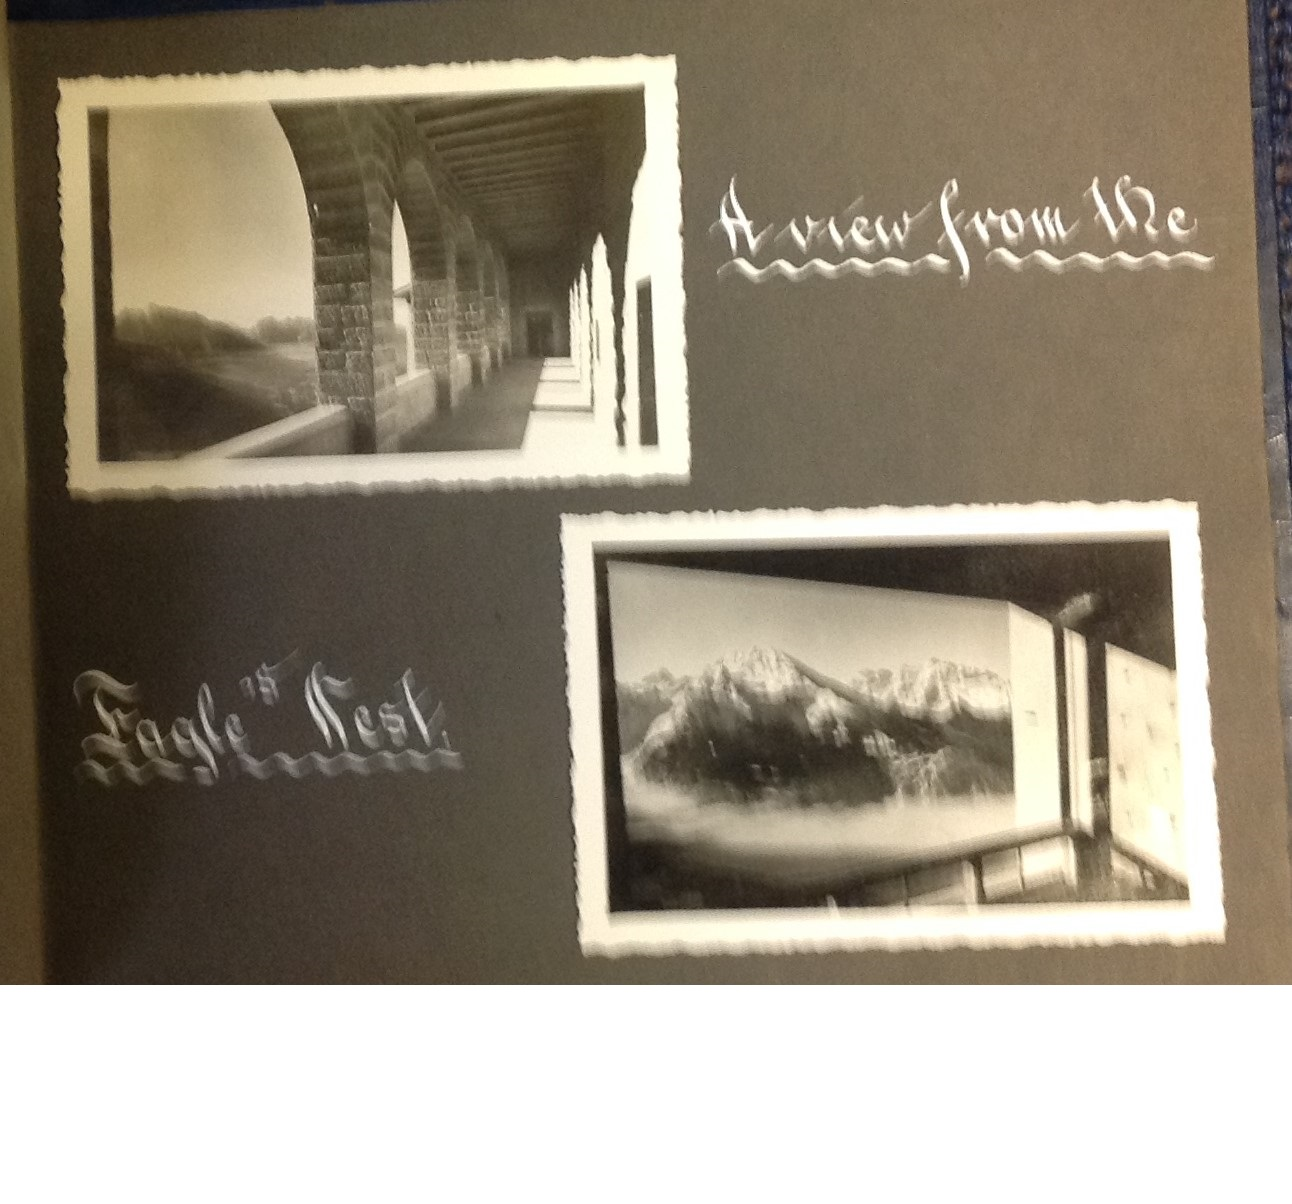 Lot 27 - Eagles Nest Berchtesgaden and Top Brass WW2 original vintage photo album. Bound album containing